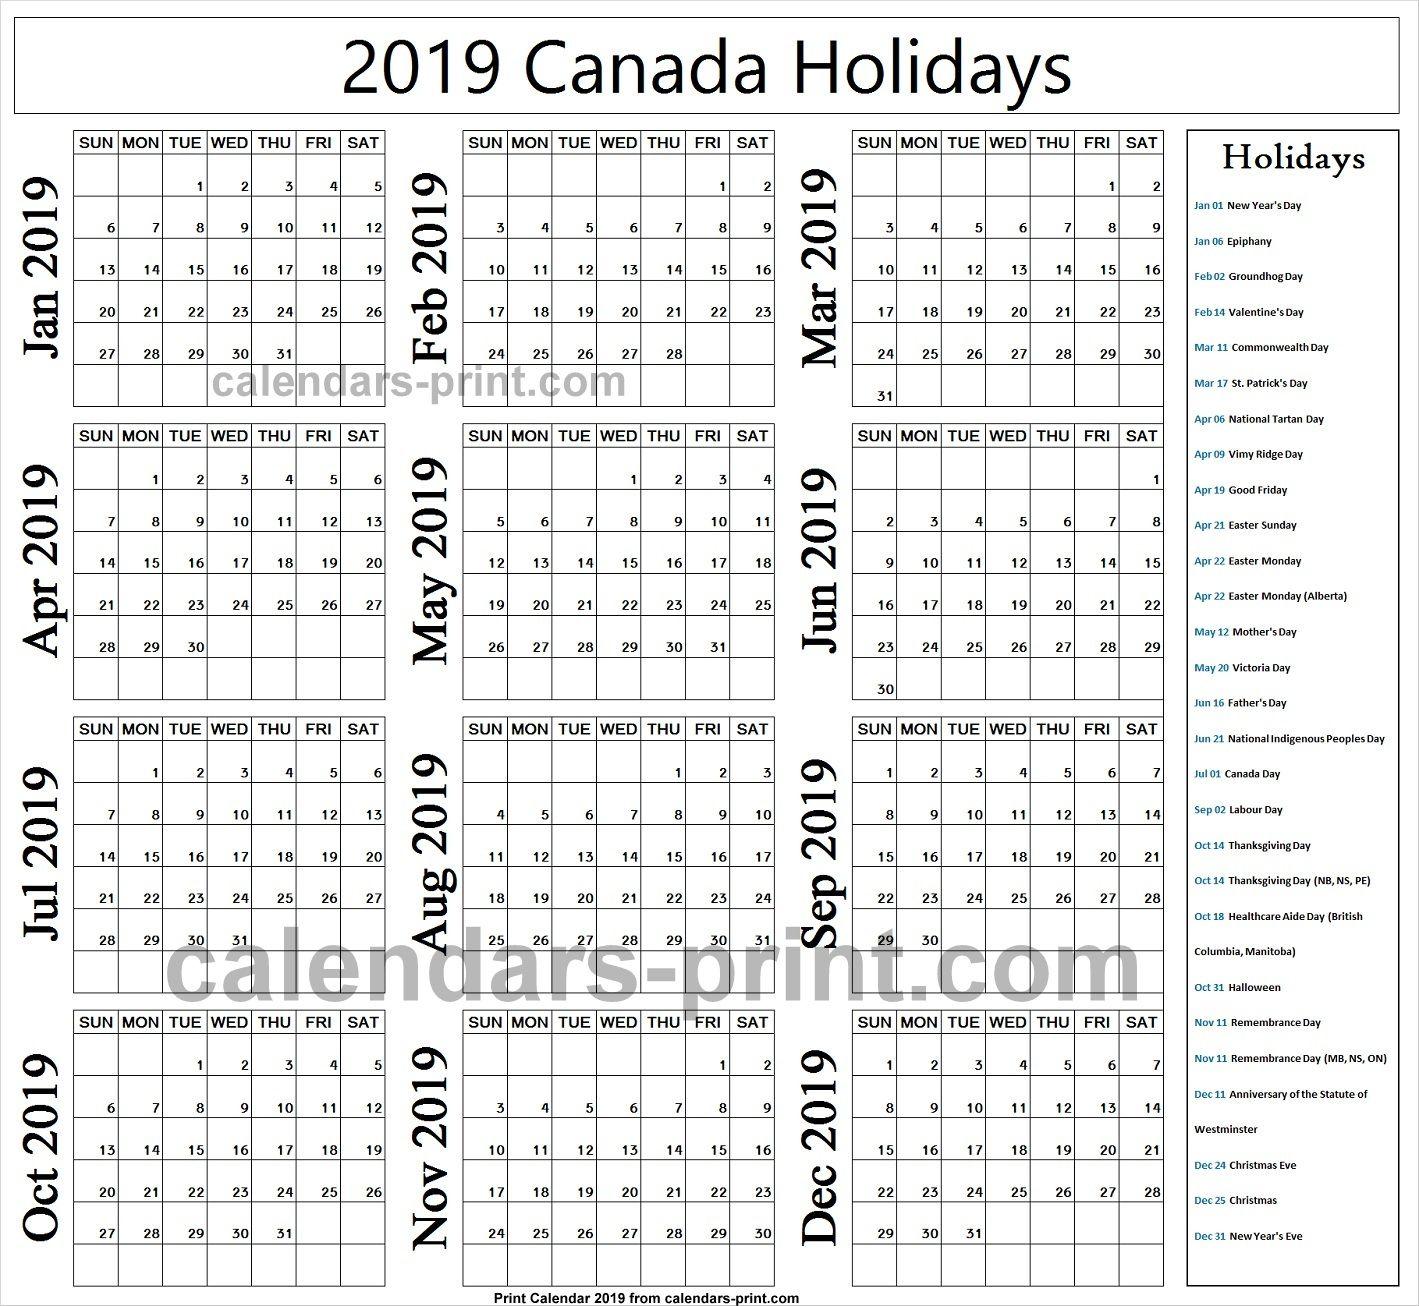 2019 Stat Holidays Canada Holiday Calendar Canada Holiday Free